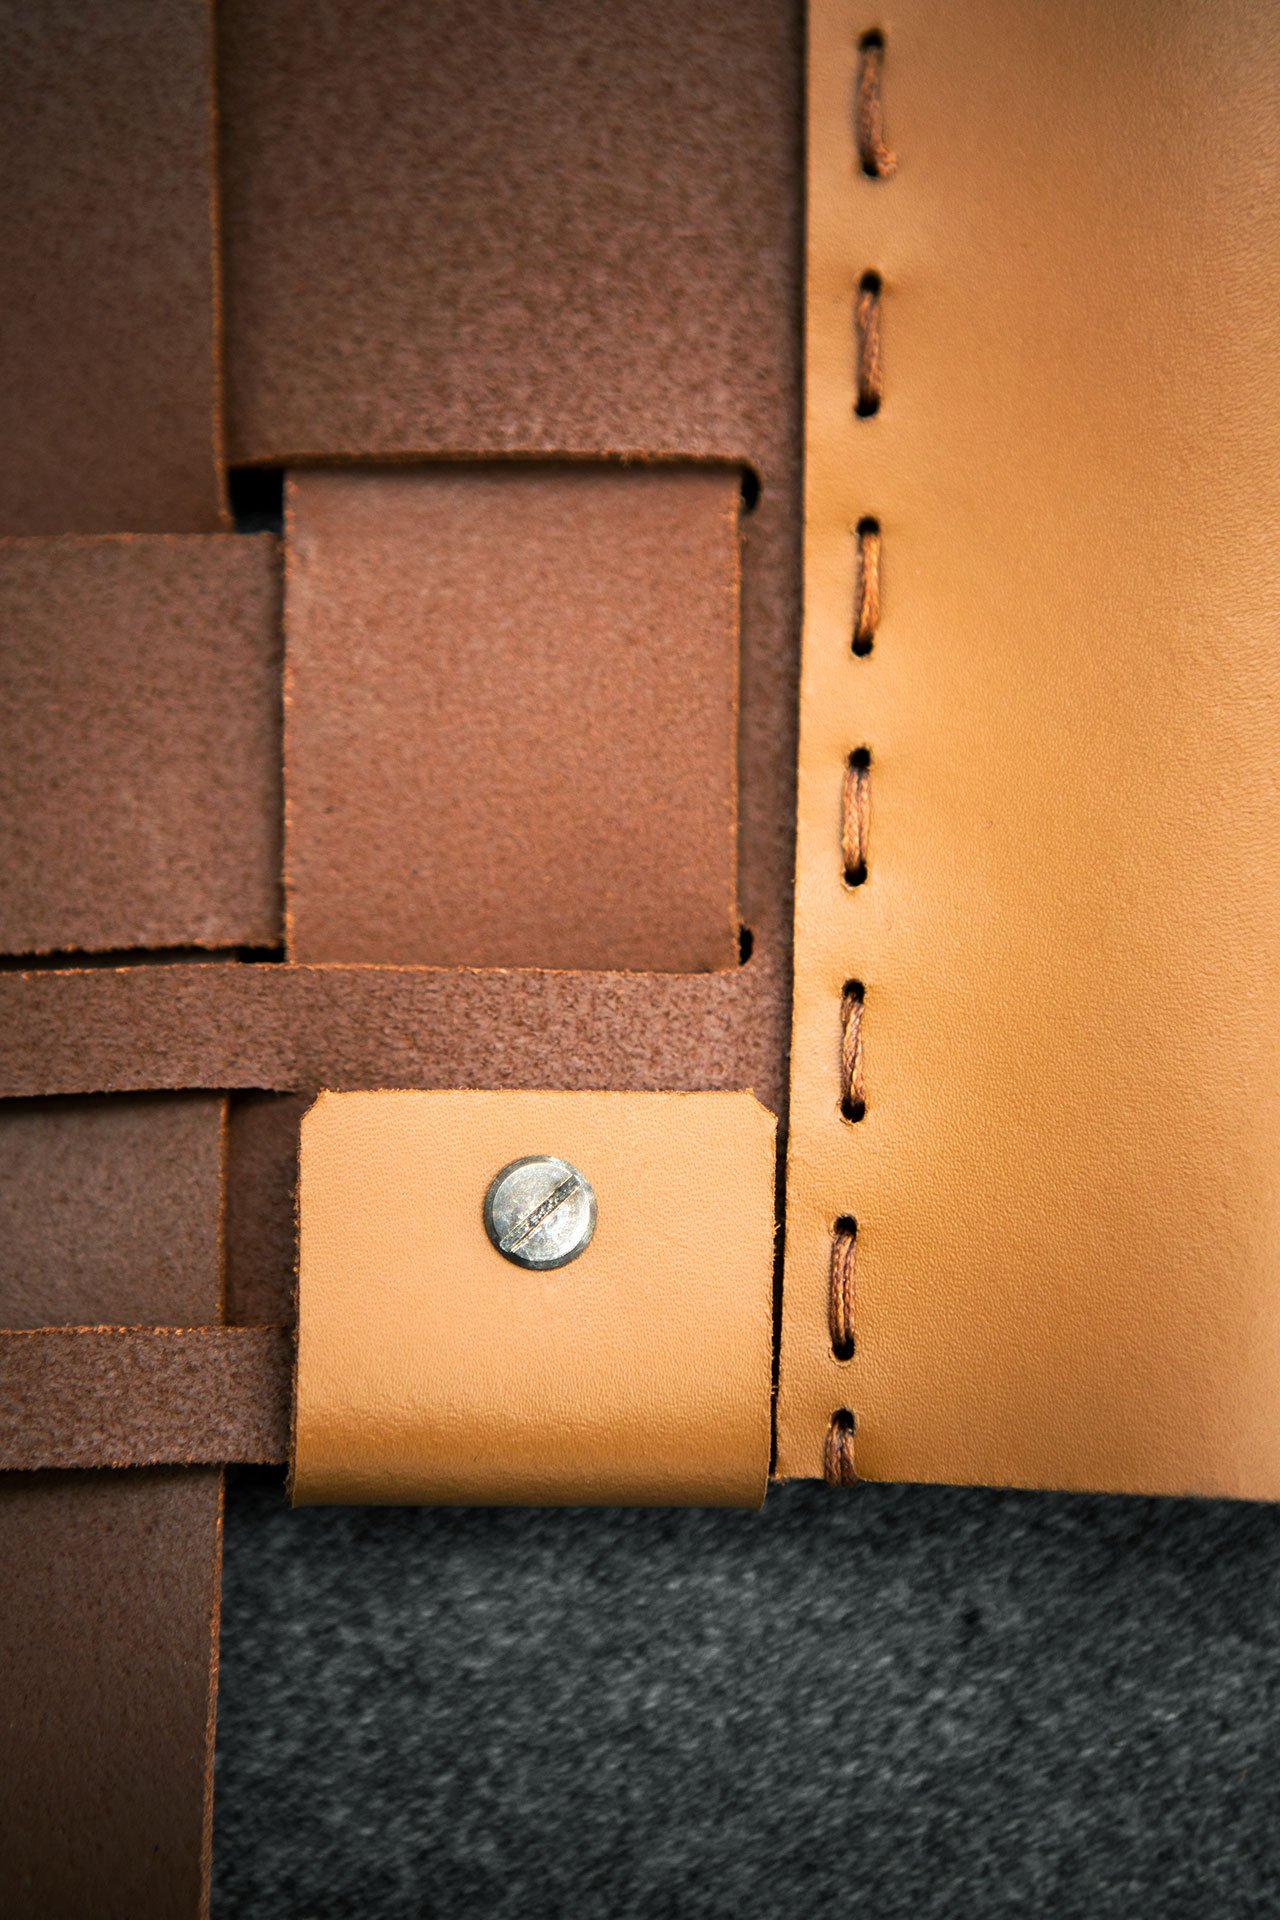 Cestonesofa(leather detail) by Antonio Citterio for Flexform. Photo© Flexform.